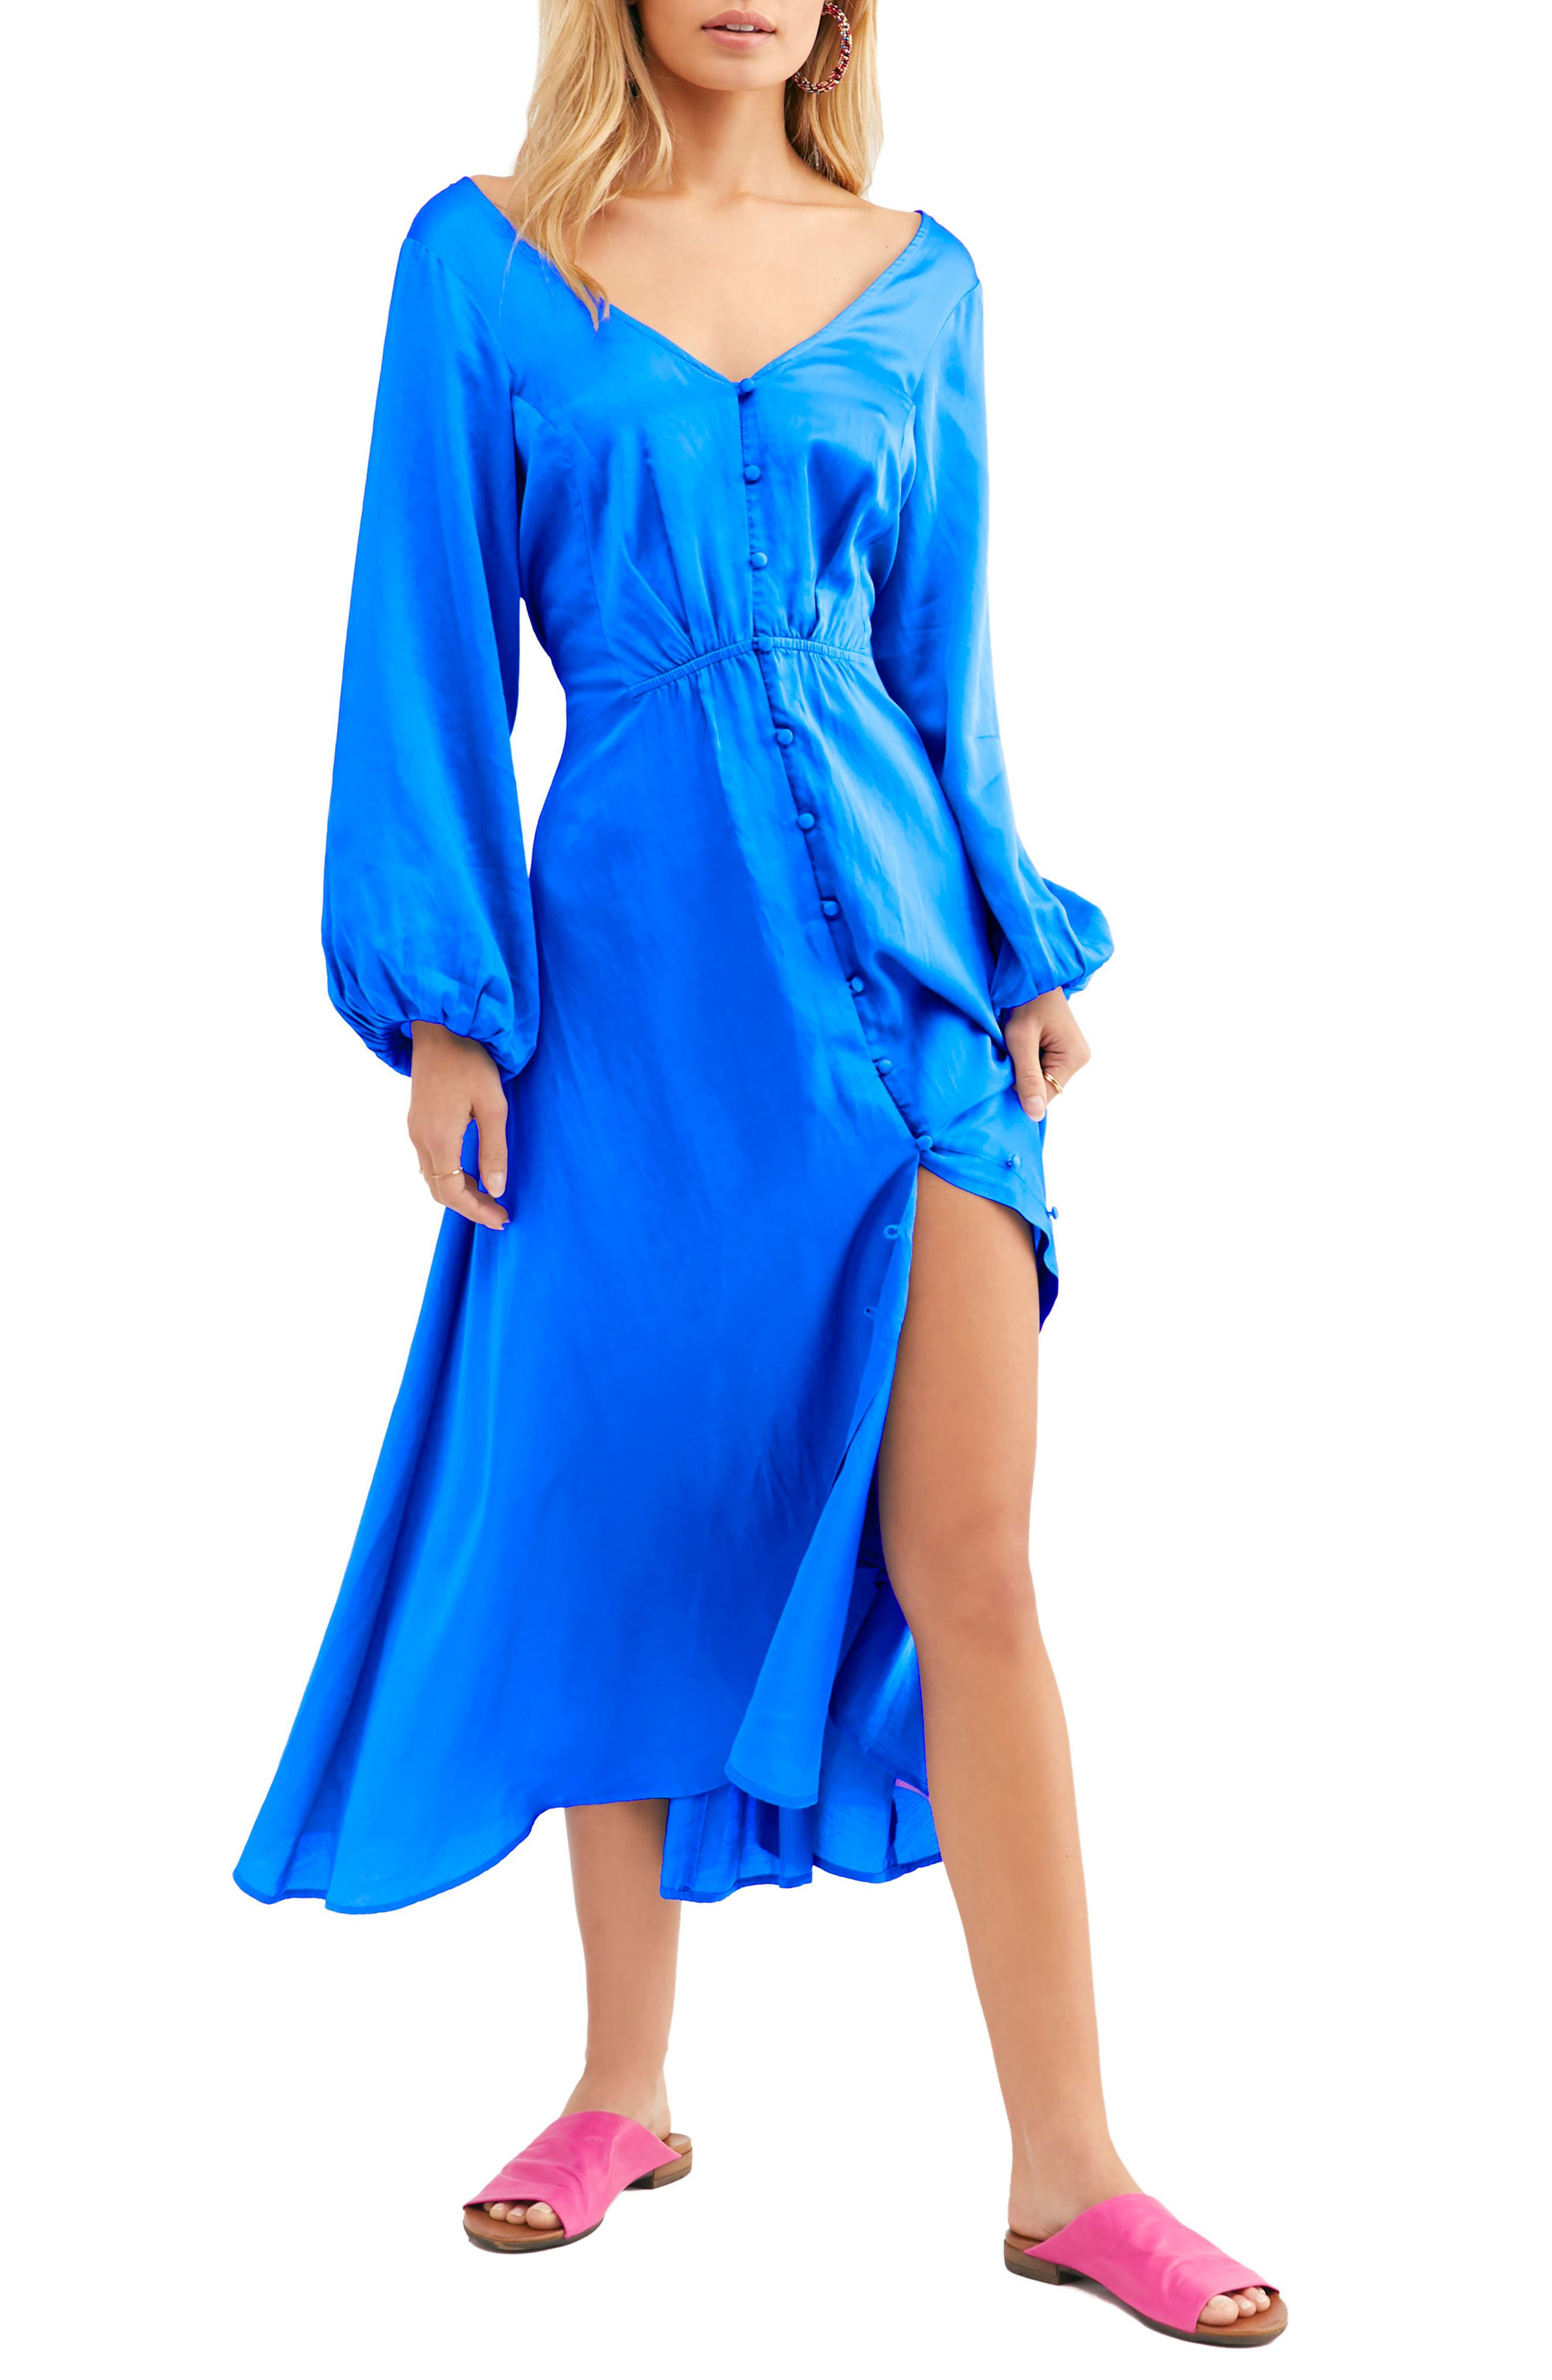 Free People Later Days Midi Dress, Blue